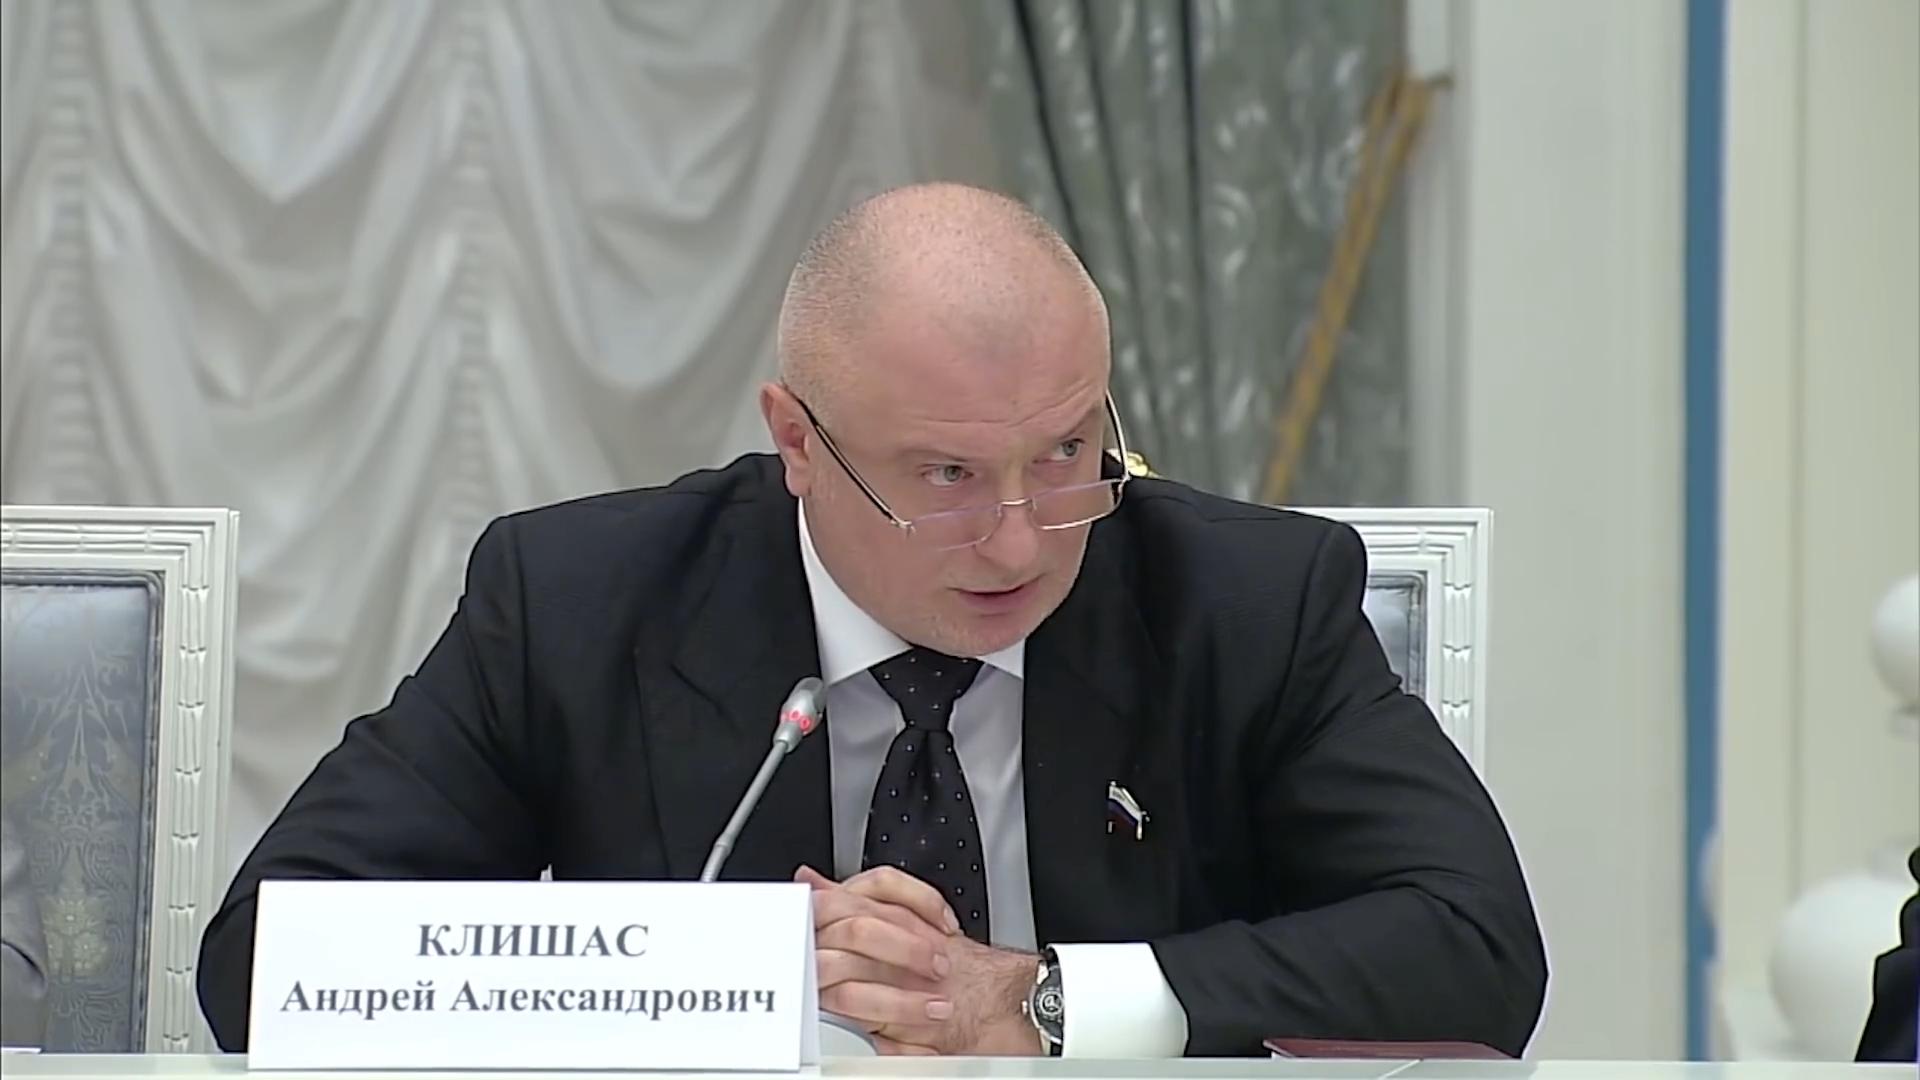 20200229_09-00-Путин сказал, куда он «уходит»-pic11